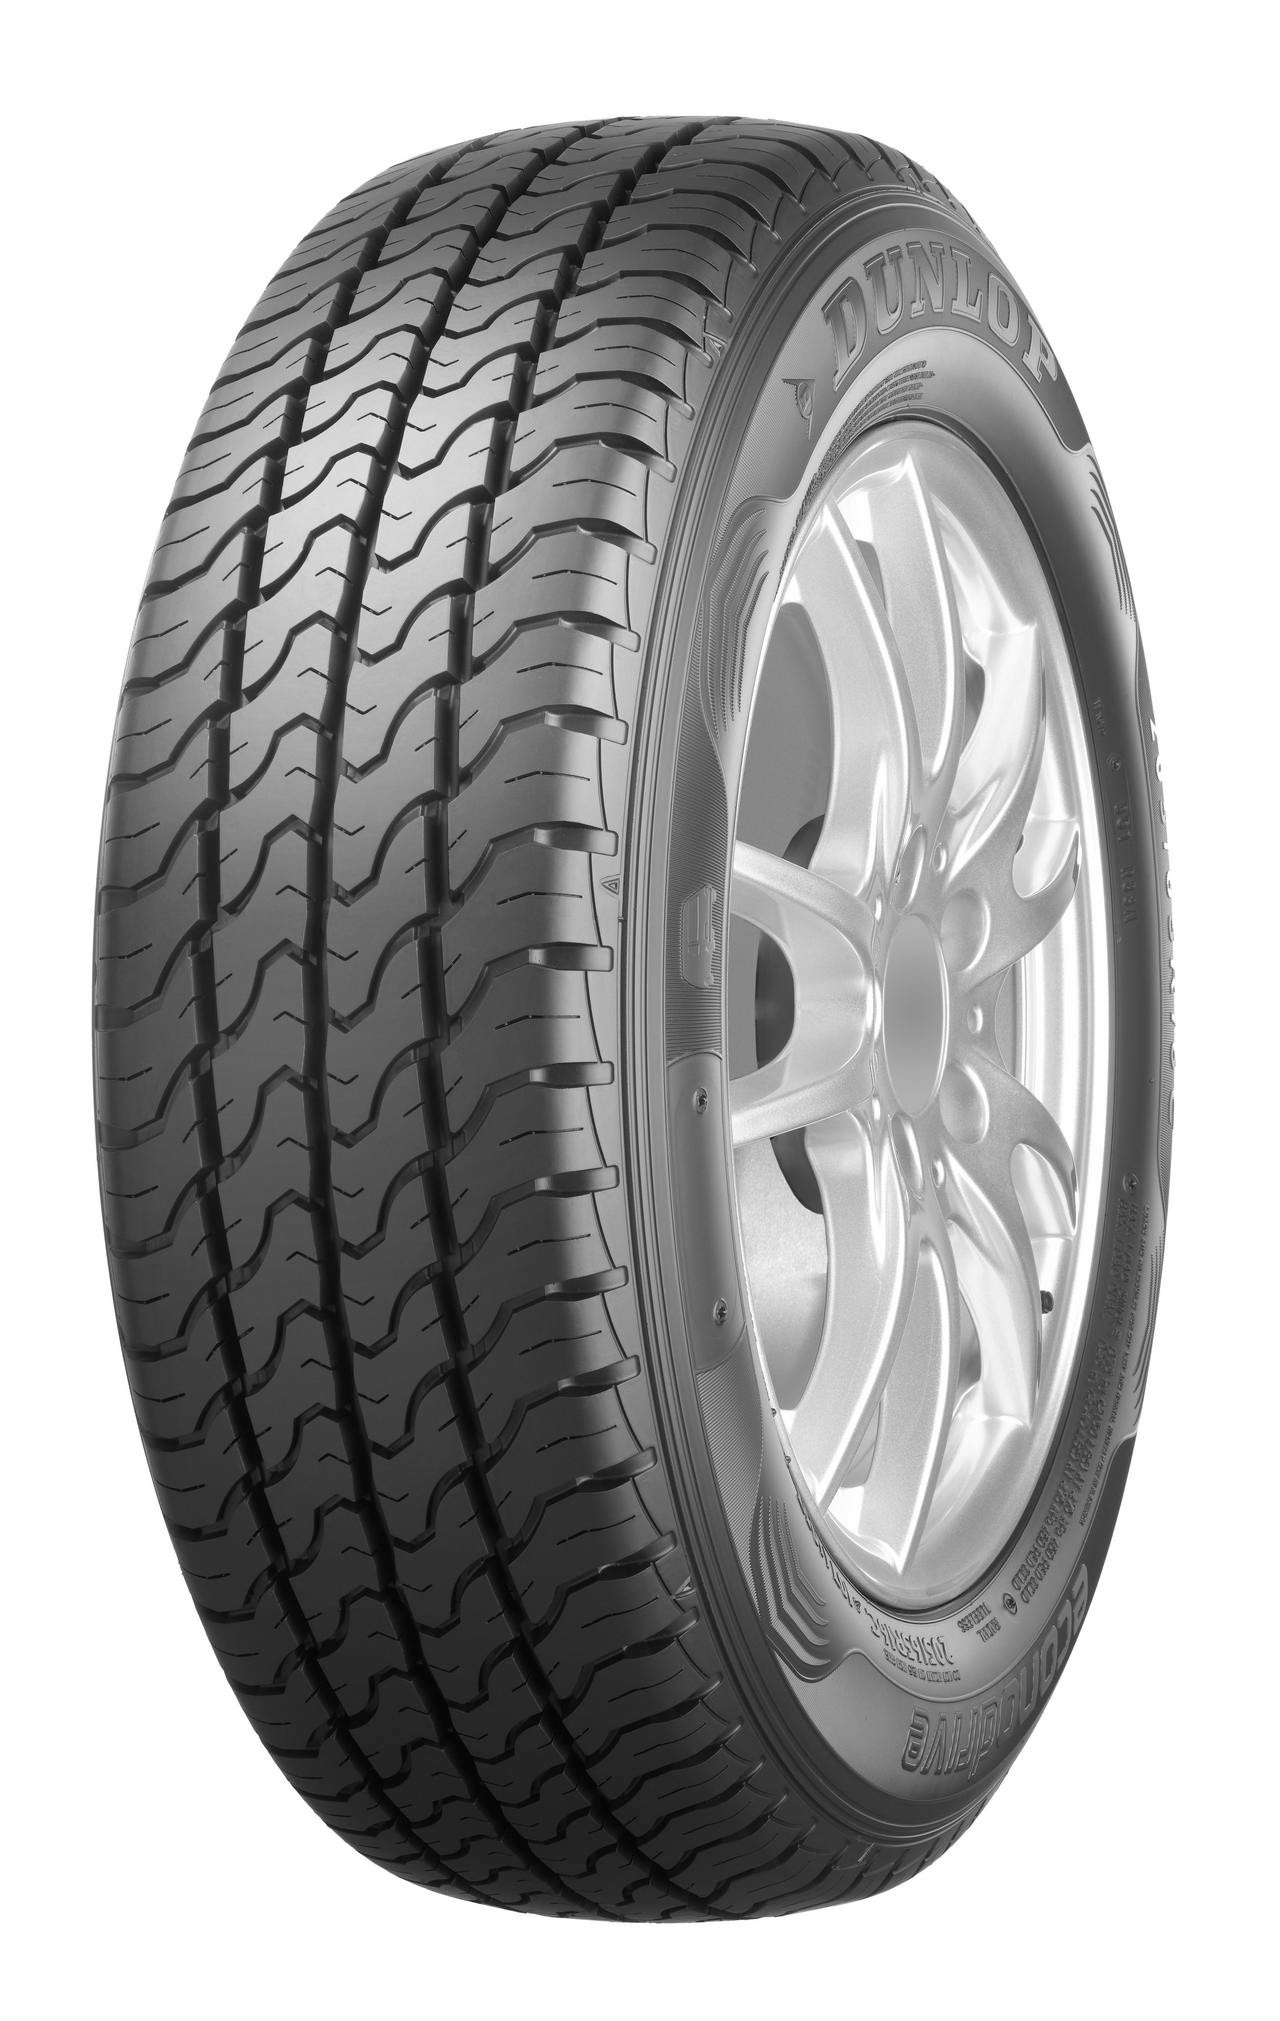 Dunlop Econodrive 205/70R15C 106/104R